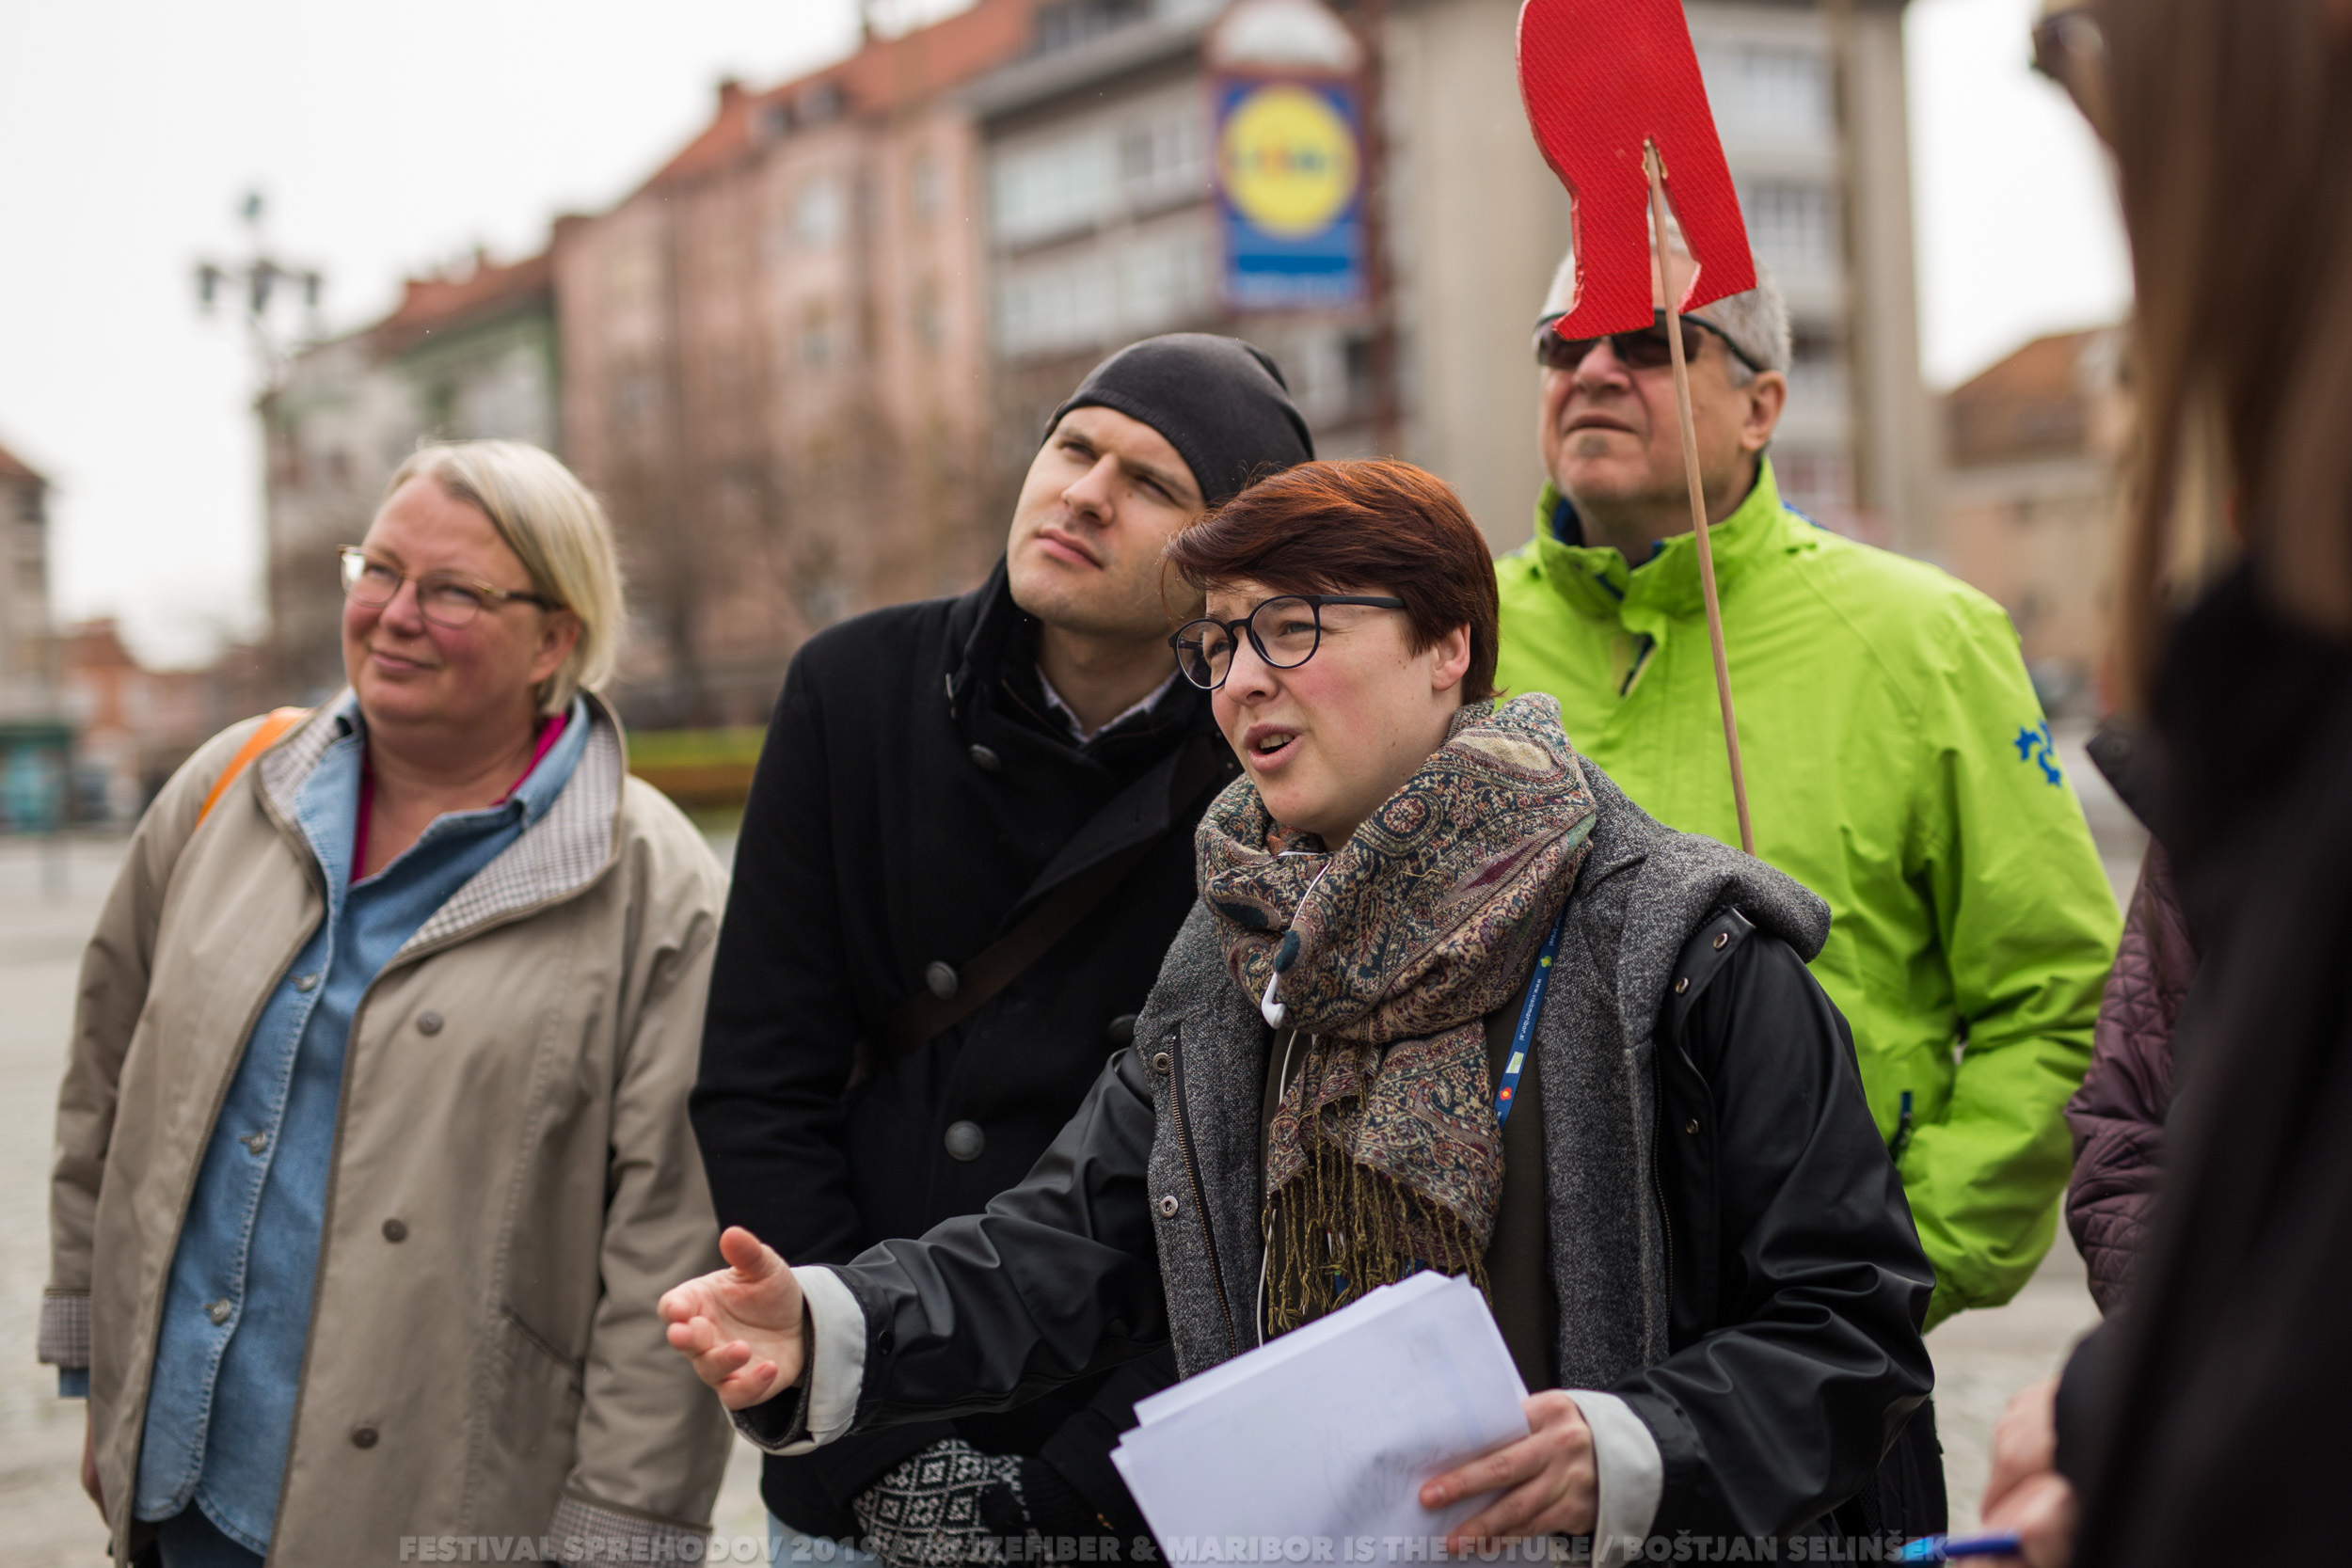 S kiparji po mestu_Boštjan Selinšek (2).jpg